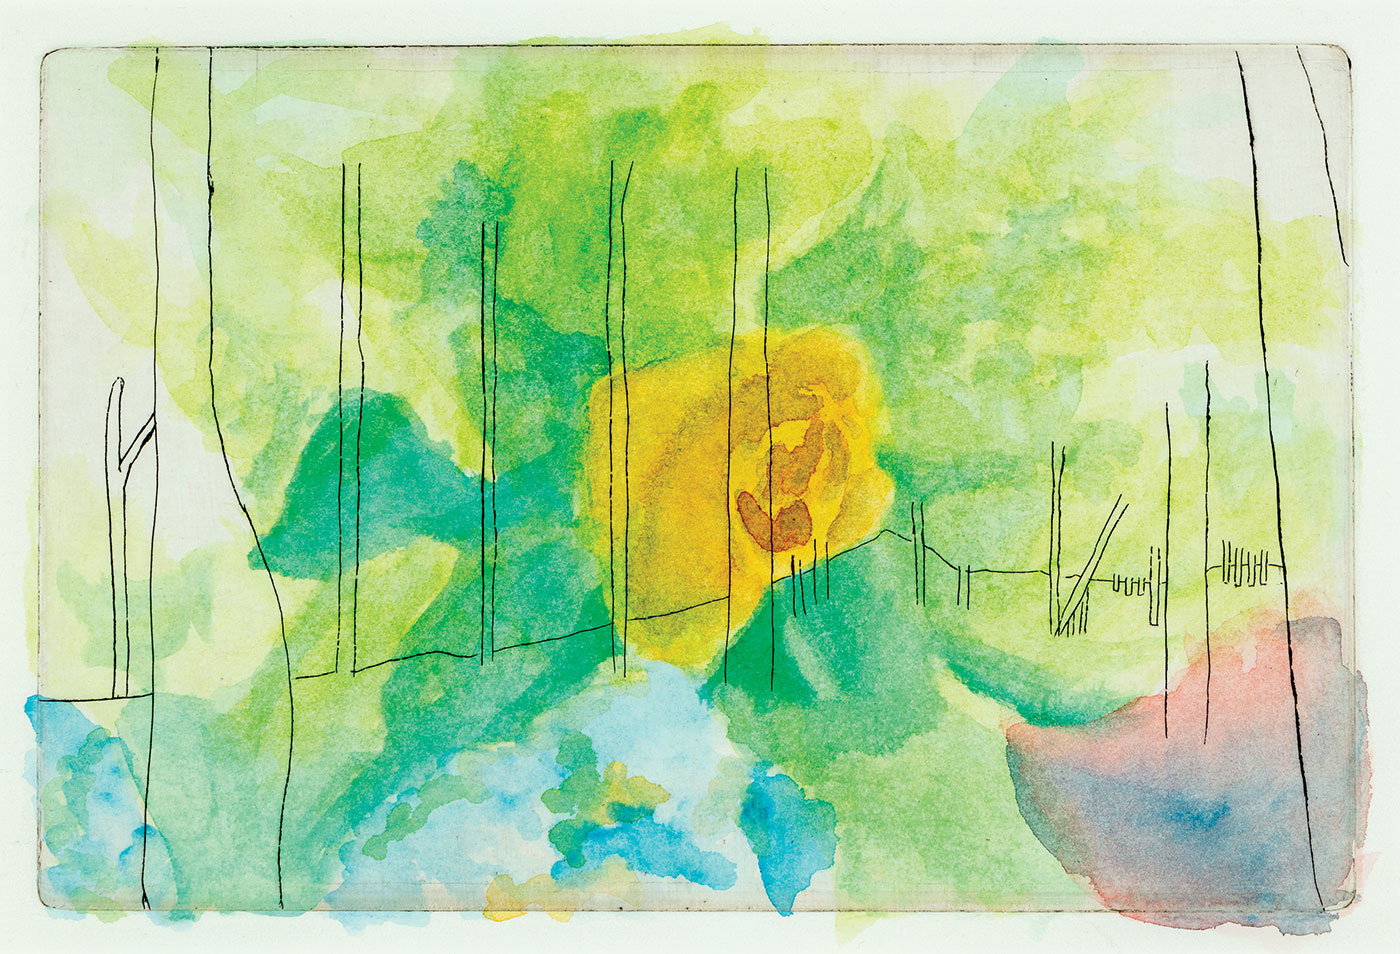 Kyra L. Segraves - Freedom